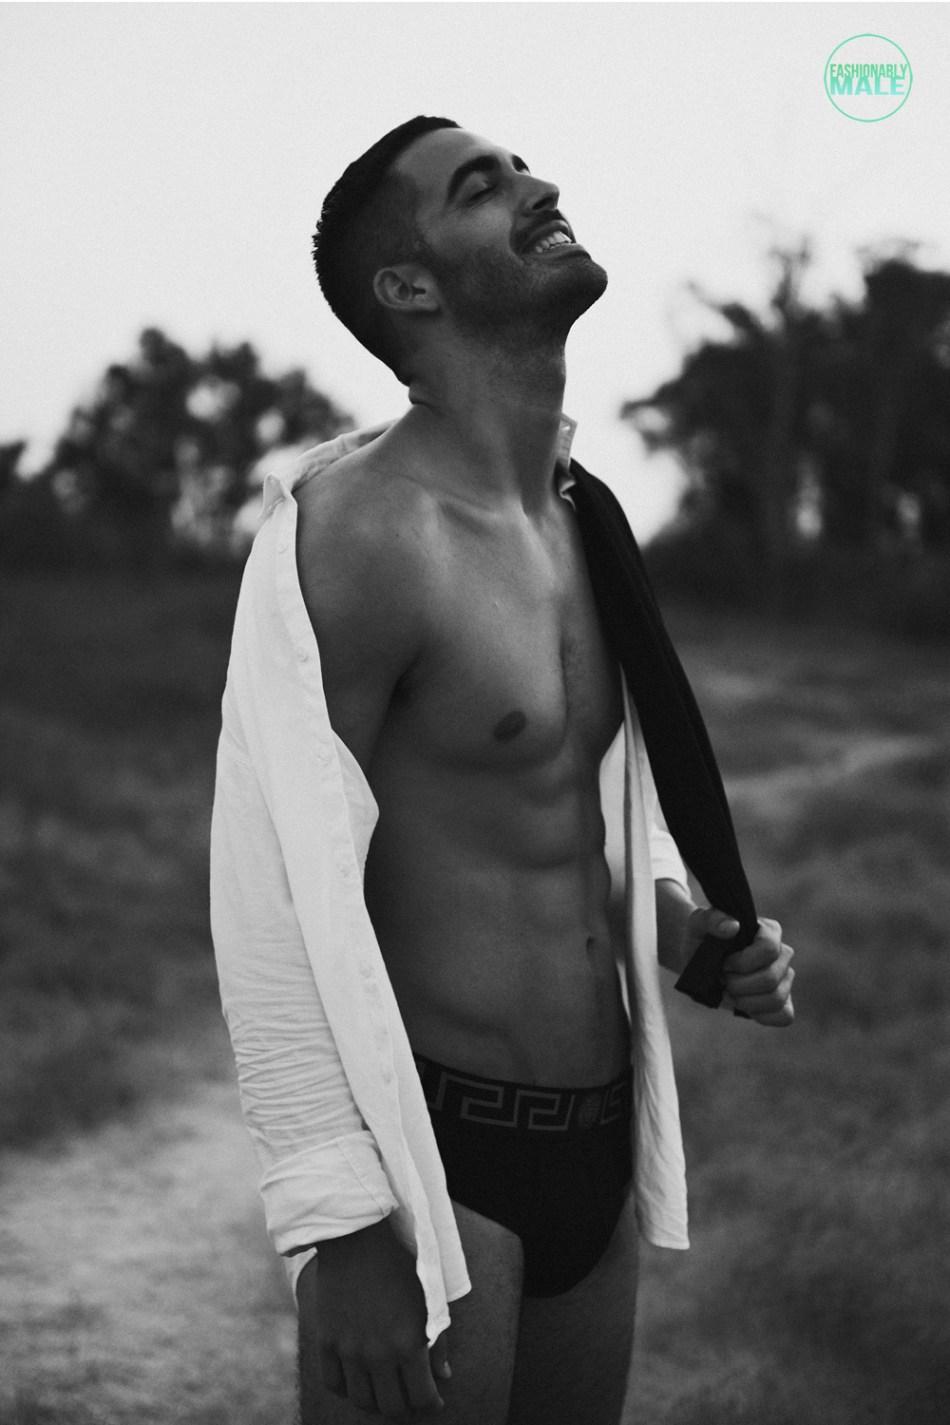 Chen Jerbi by Eran Levi for Fashionably Male15